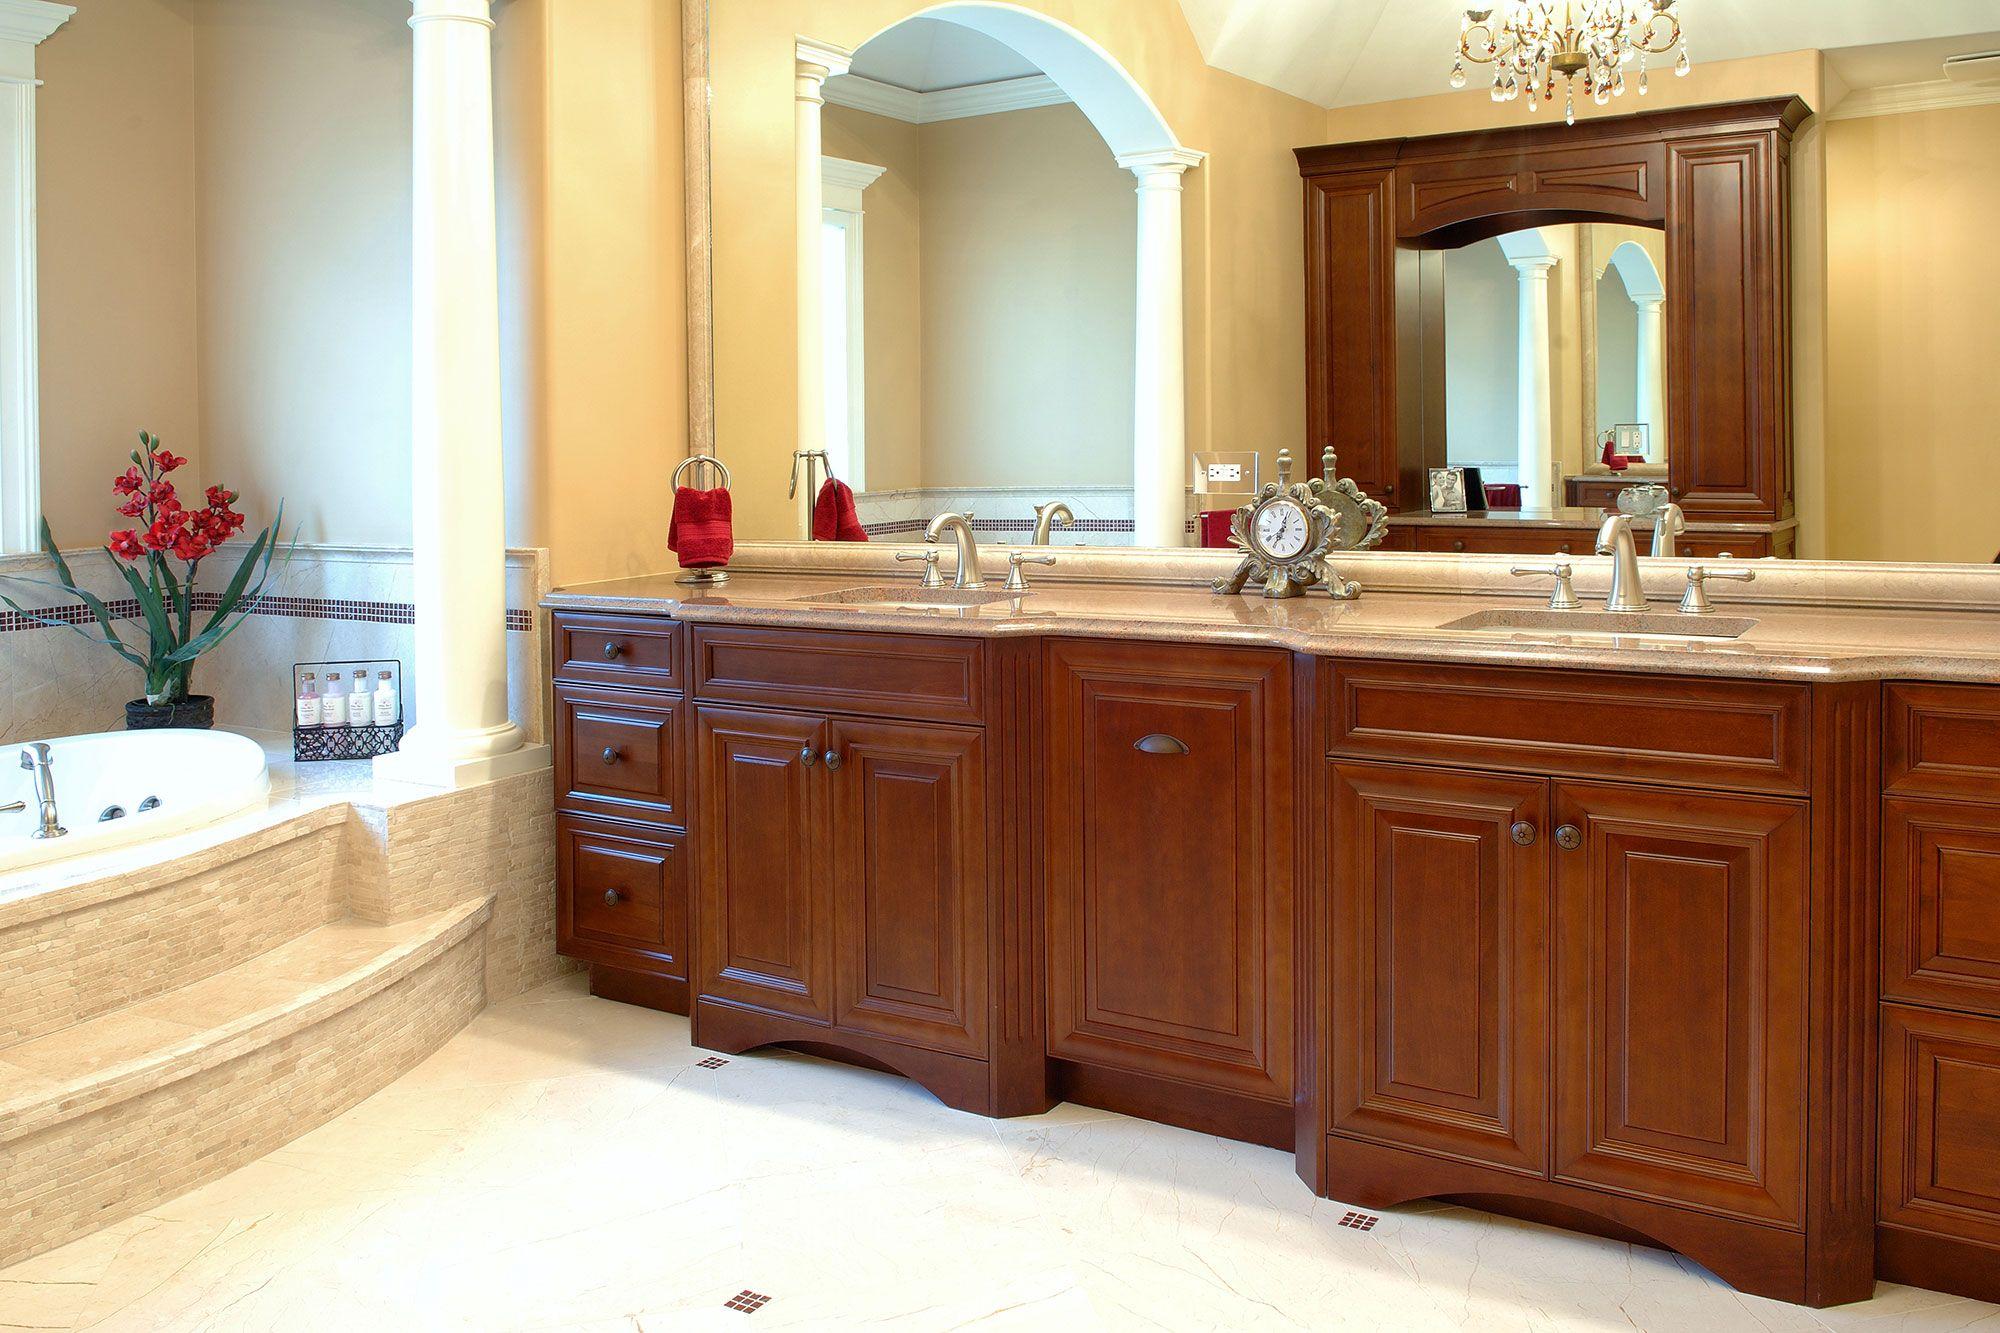 Cherry Slideshow Kitchen Cabinets Bathroom Vanity